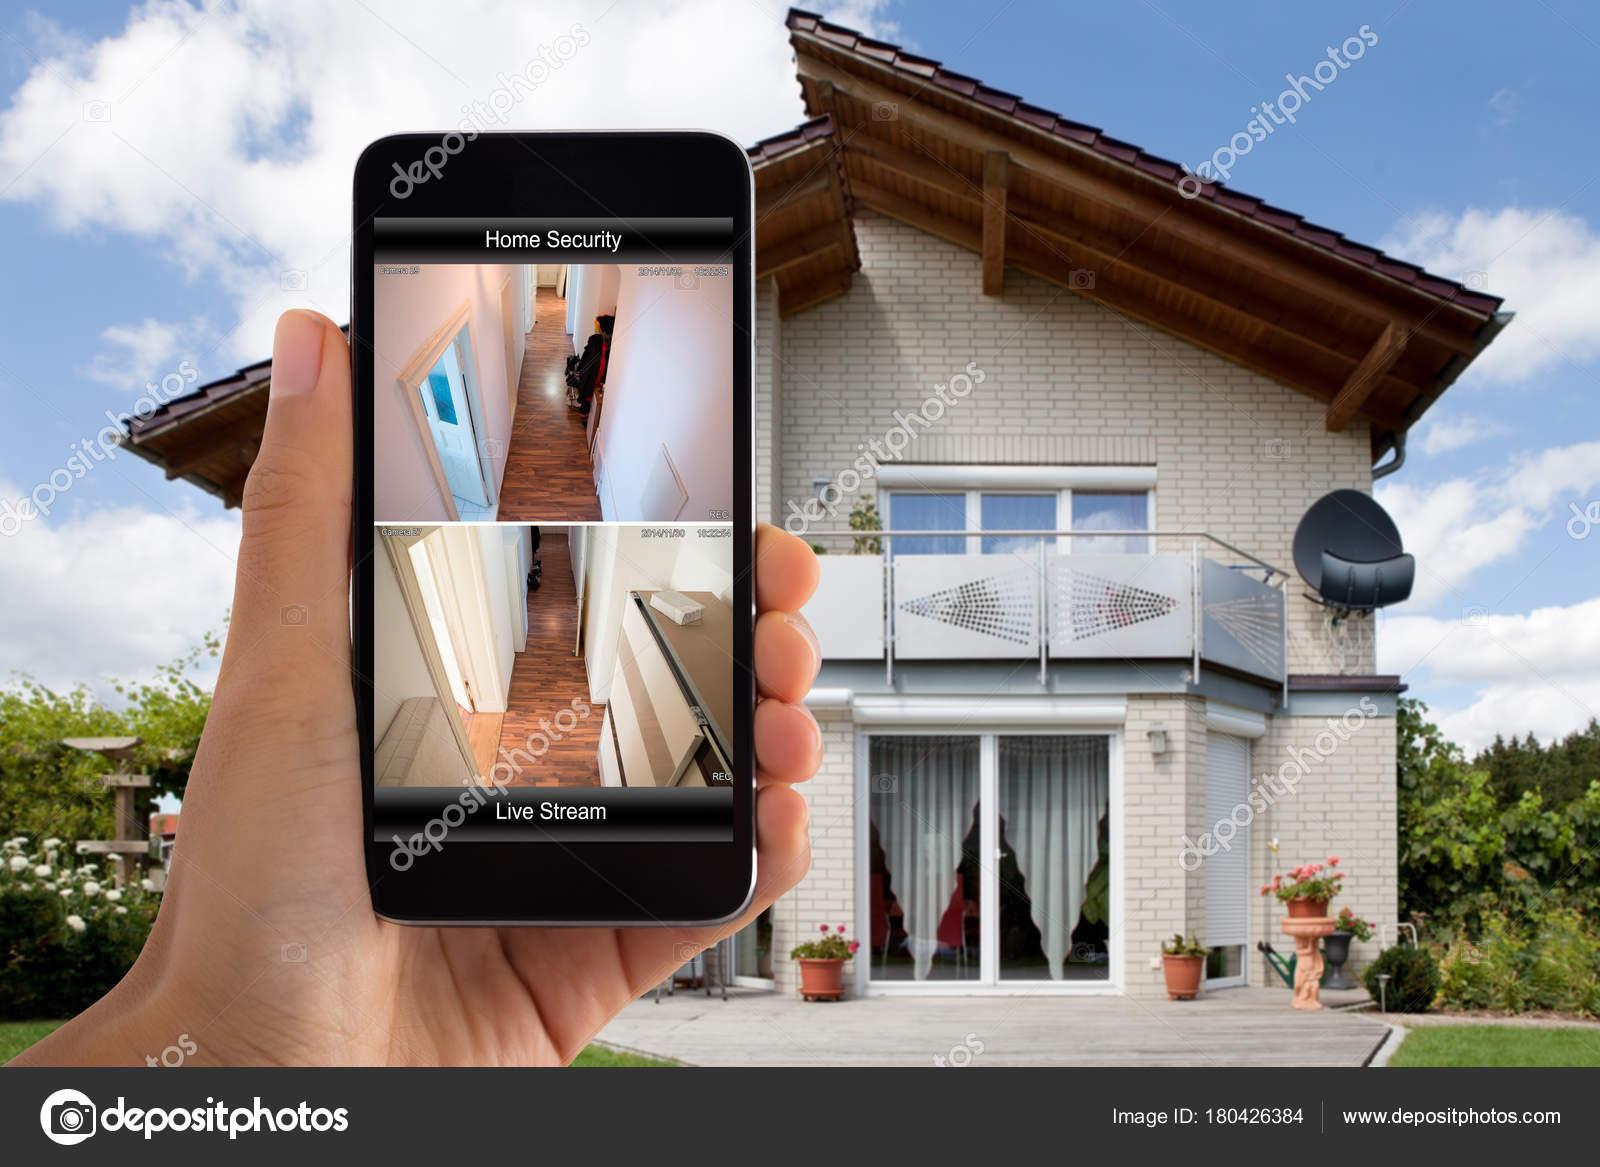 3dfc8e1fcc Primer Plano Mano Persona Usando Sistema Seguridad Para Hogar Teléfono —  Fotos de Stock